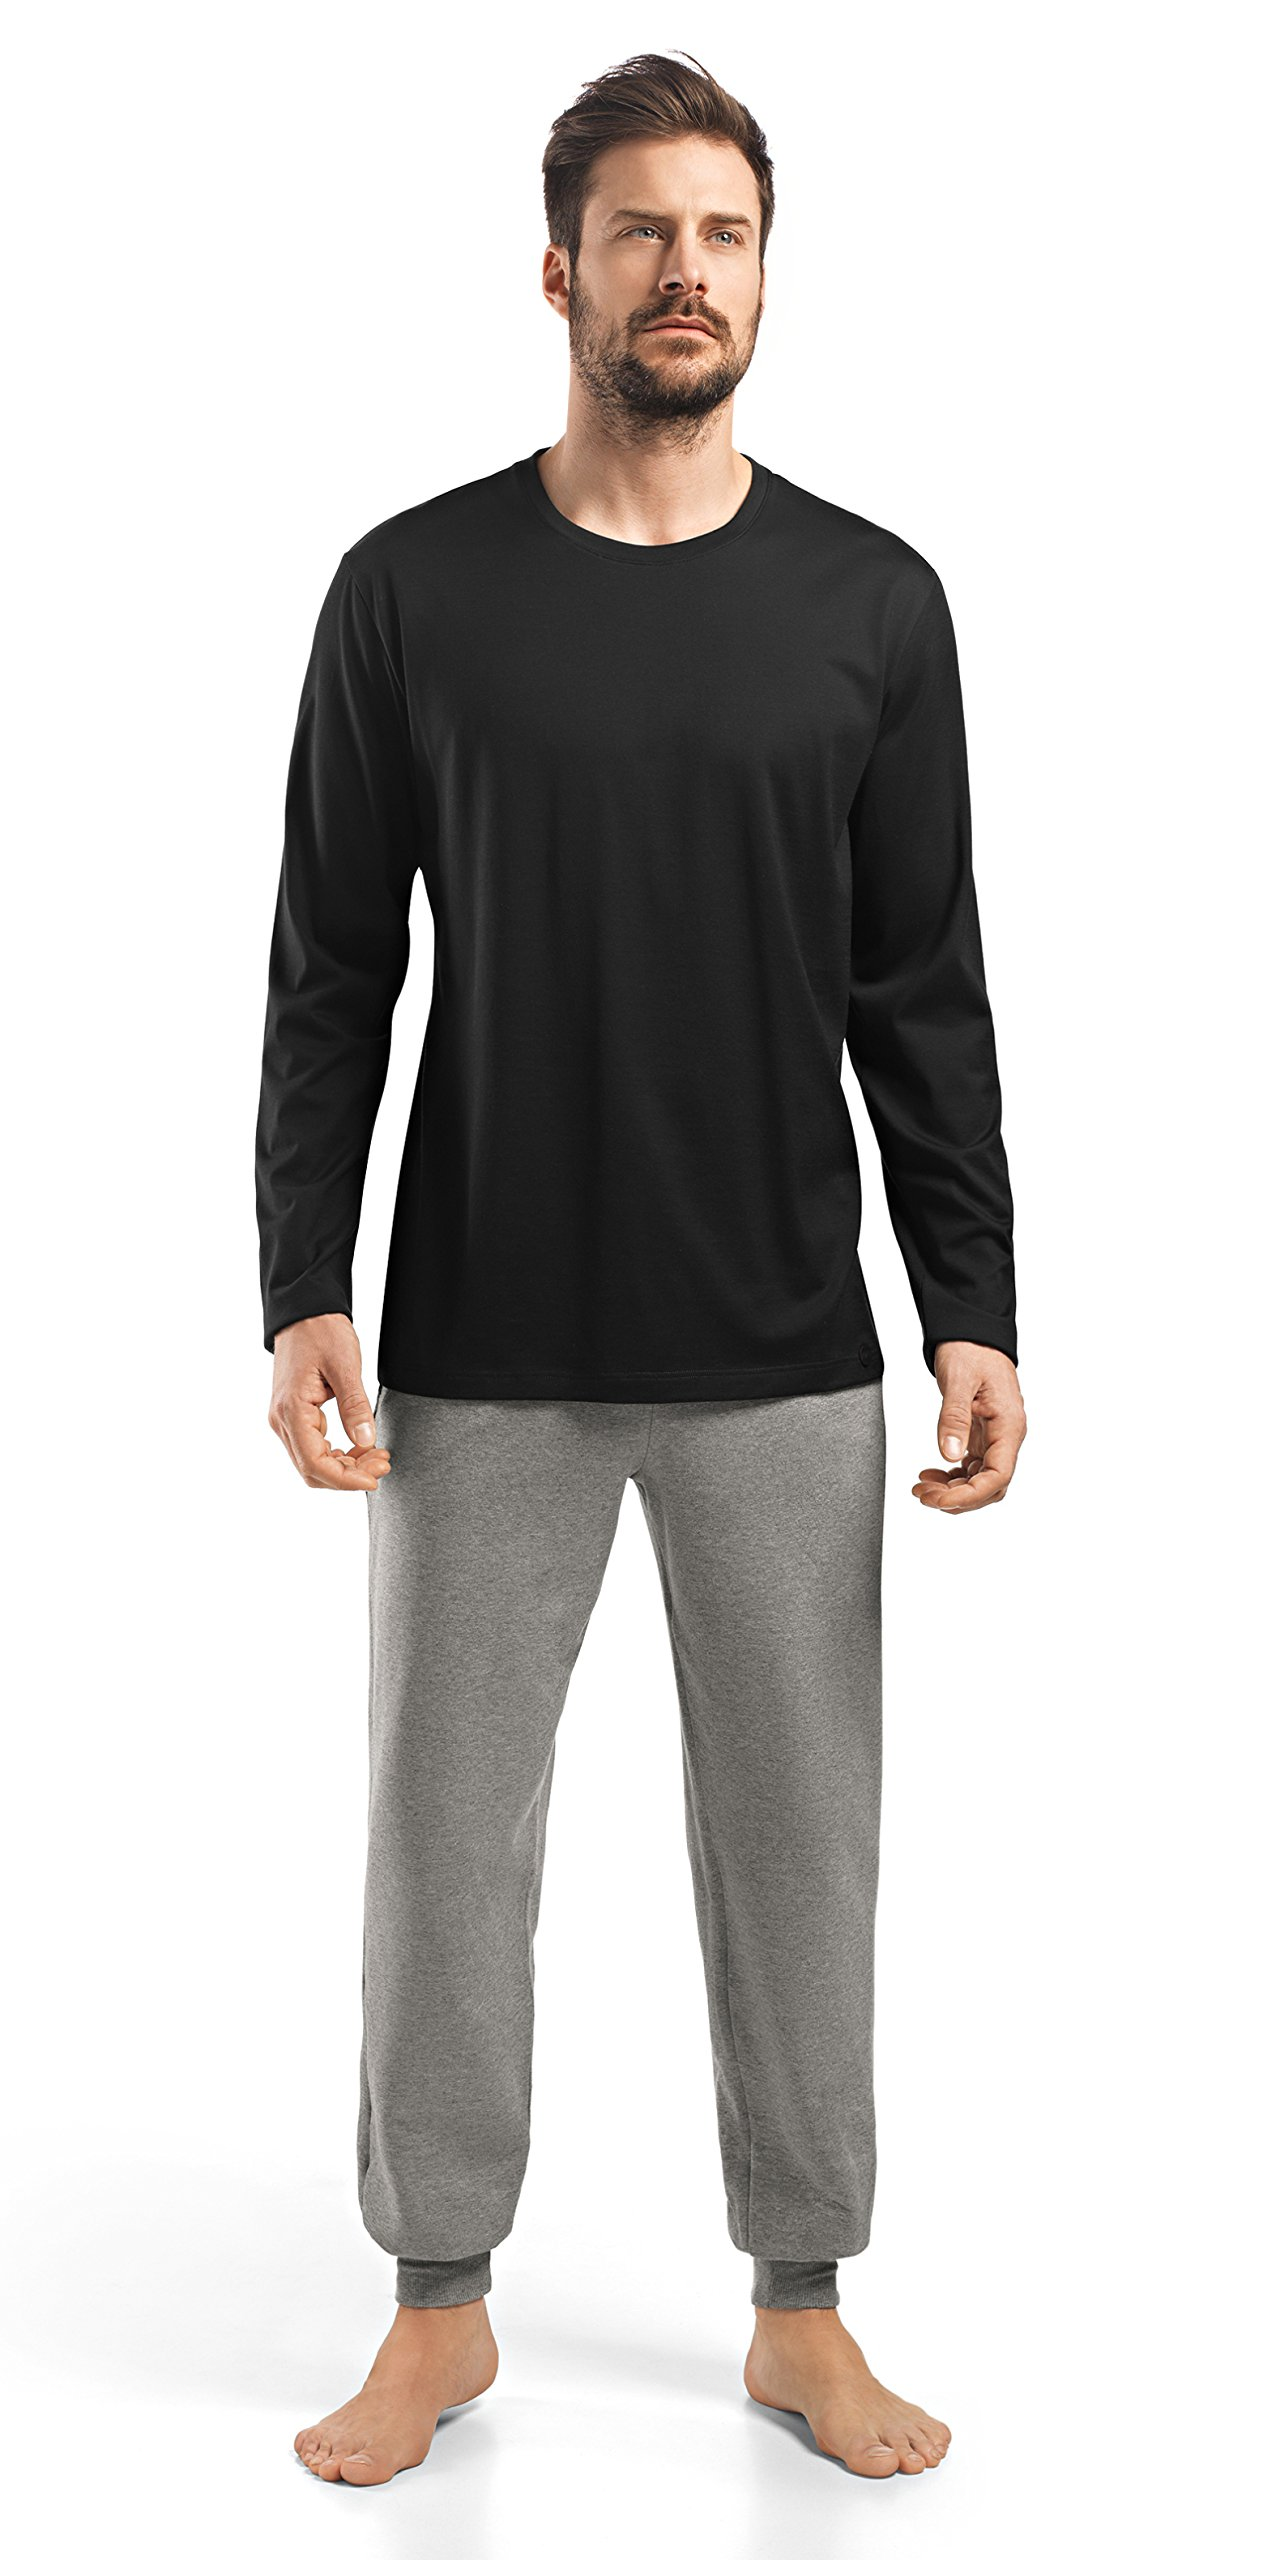 HANRO Men's Night and Day Long Sleeve Shirt, Black, Medium